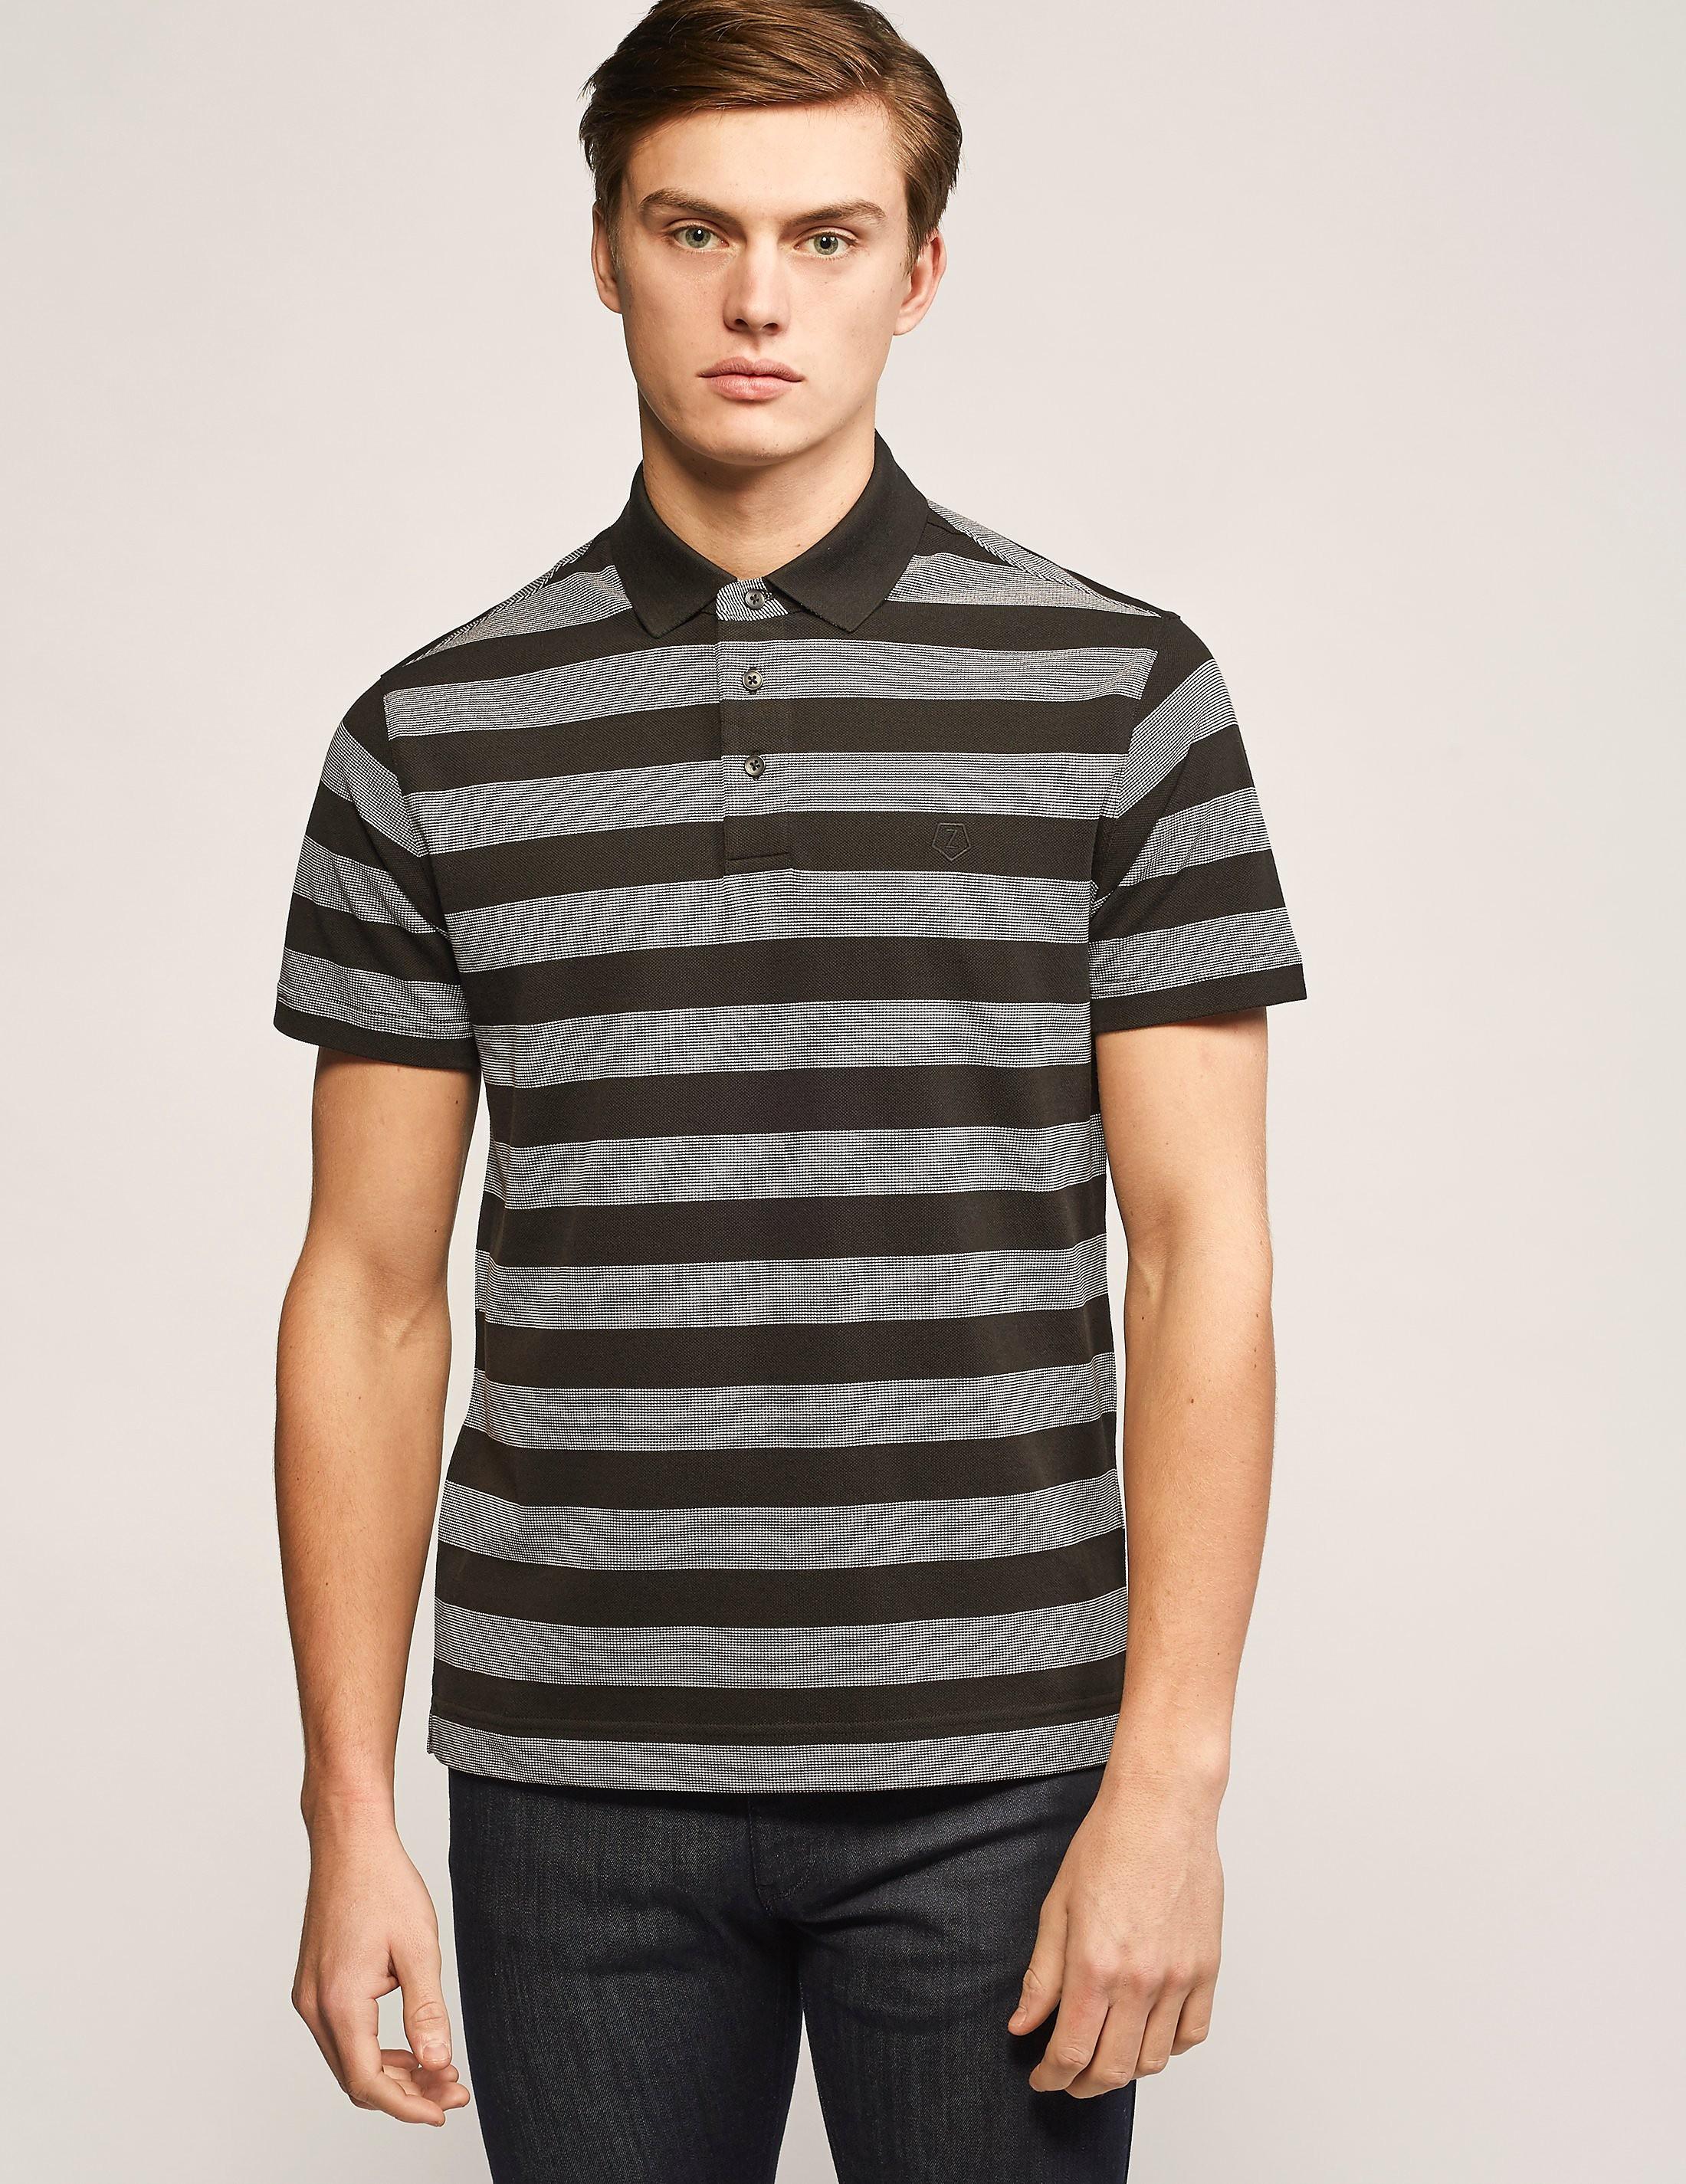 Z Zegna Stripe Polo Shirt